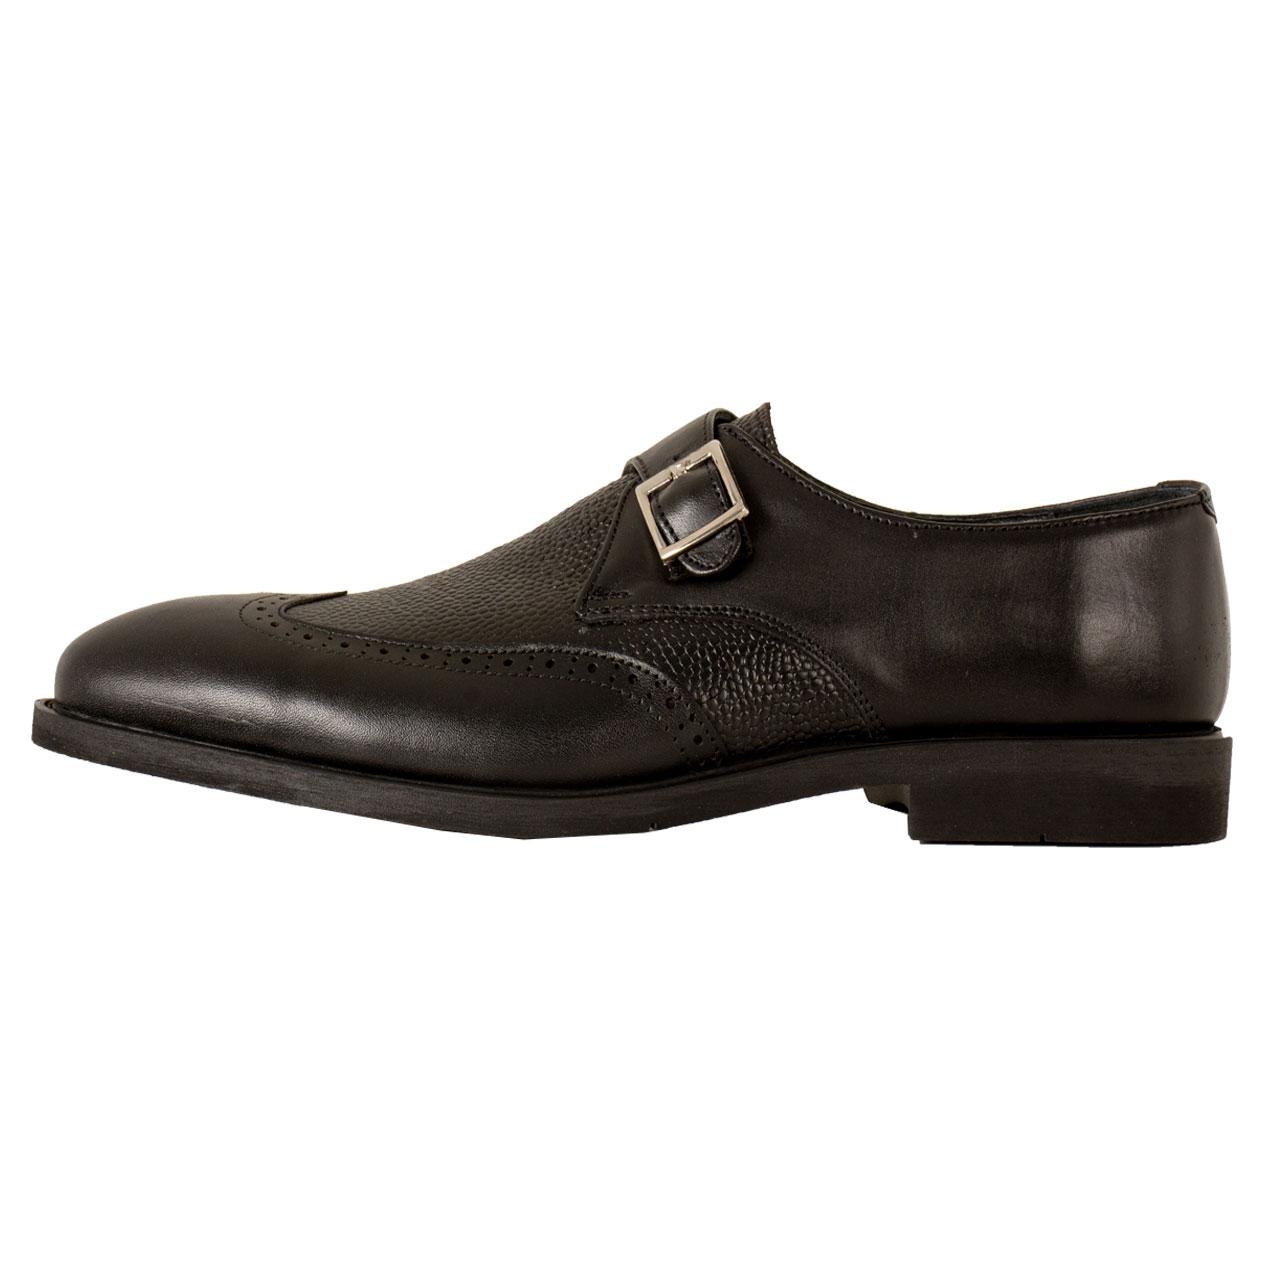 کفش مردانه پارینه چرم مدل SHO211